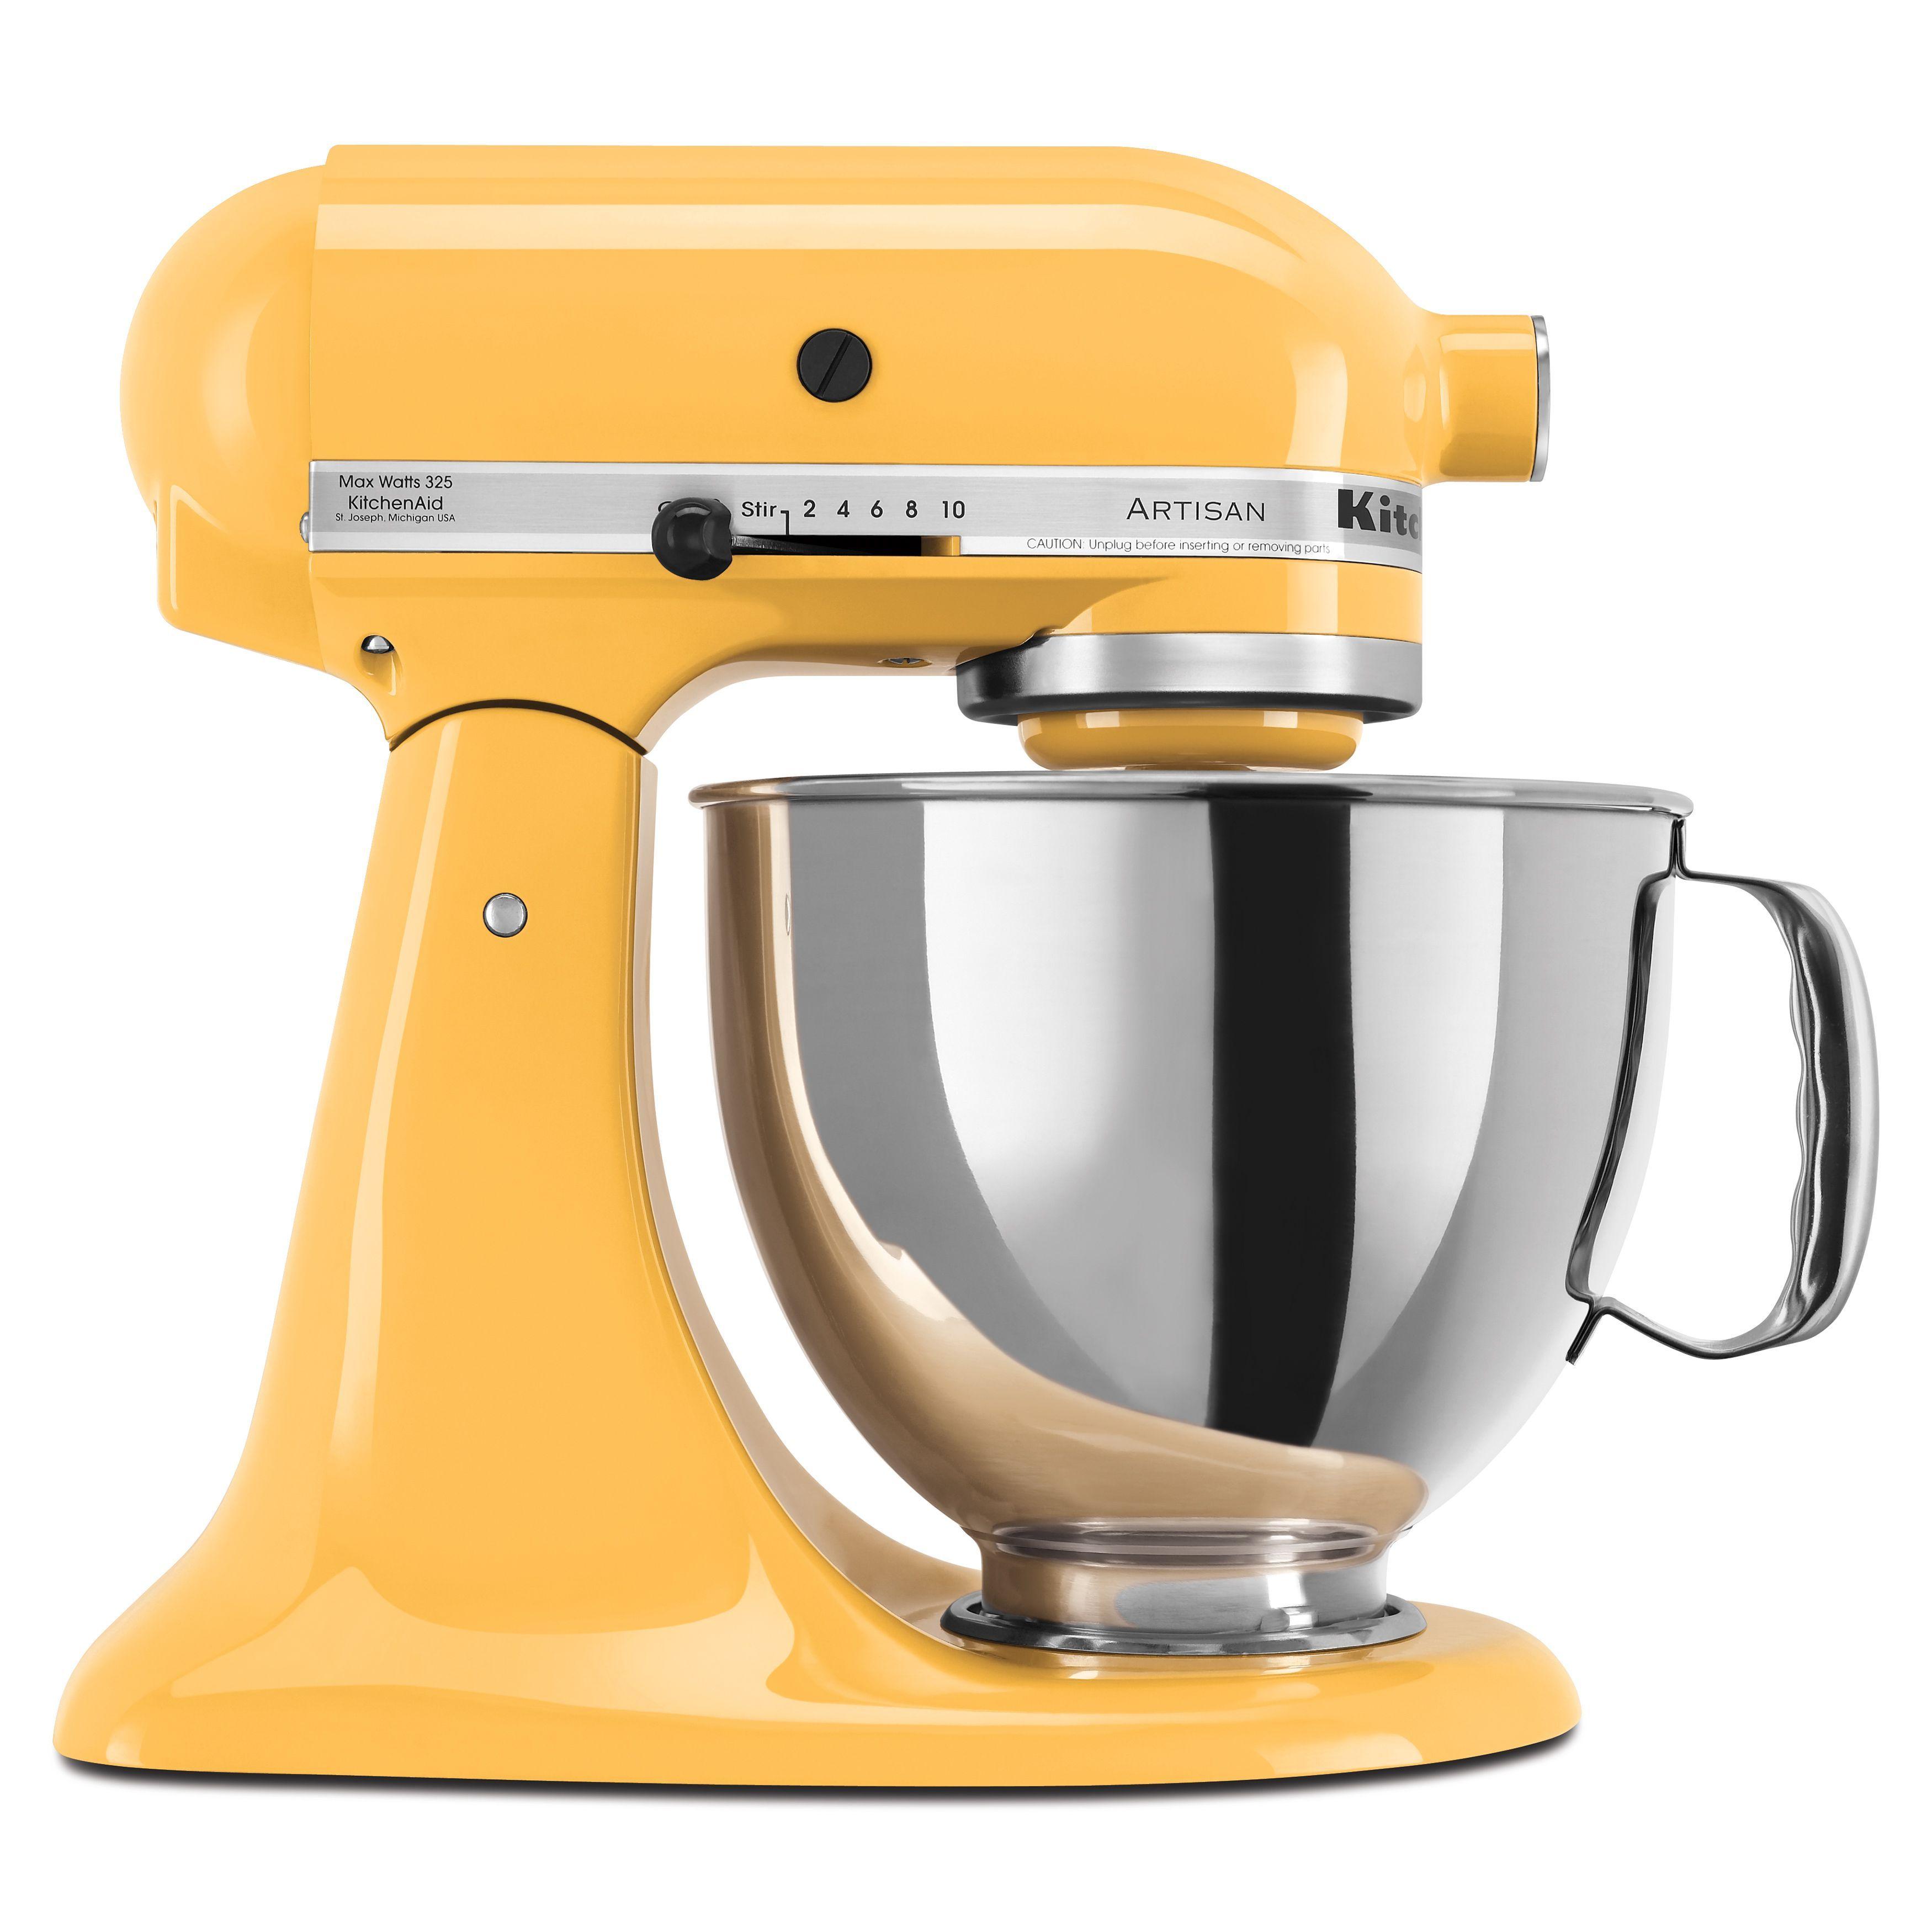 KitchenAid KSM150PSBF ercup Artisan Series 5-quart Stand Mixer ... on kitchenaid mixer accessories, kitchenaid mixer kmart, kitchenaid mixer gift, kitchenaid mixer special, kitchenaid mixer pricing,